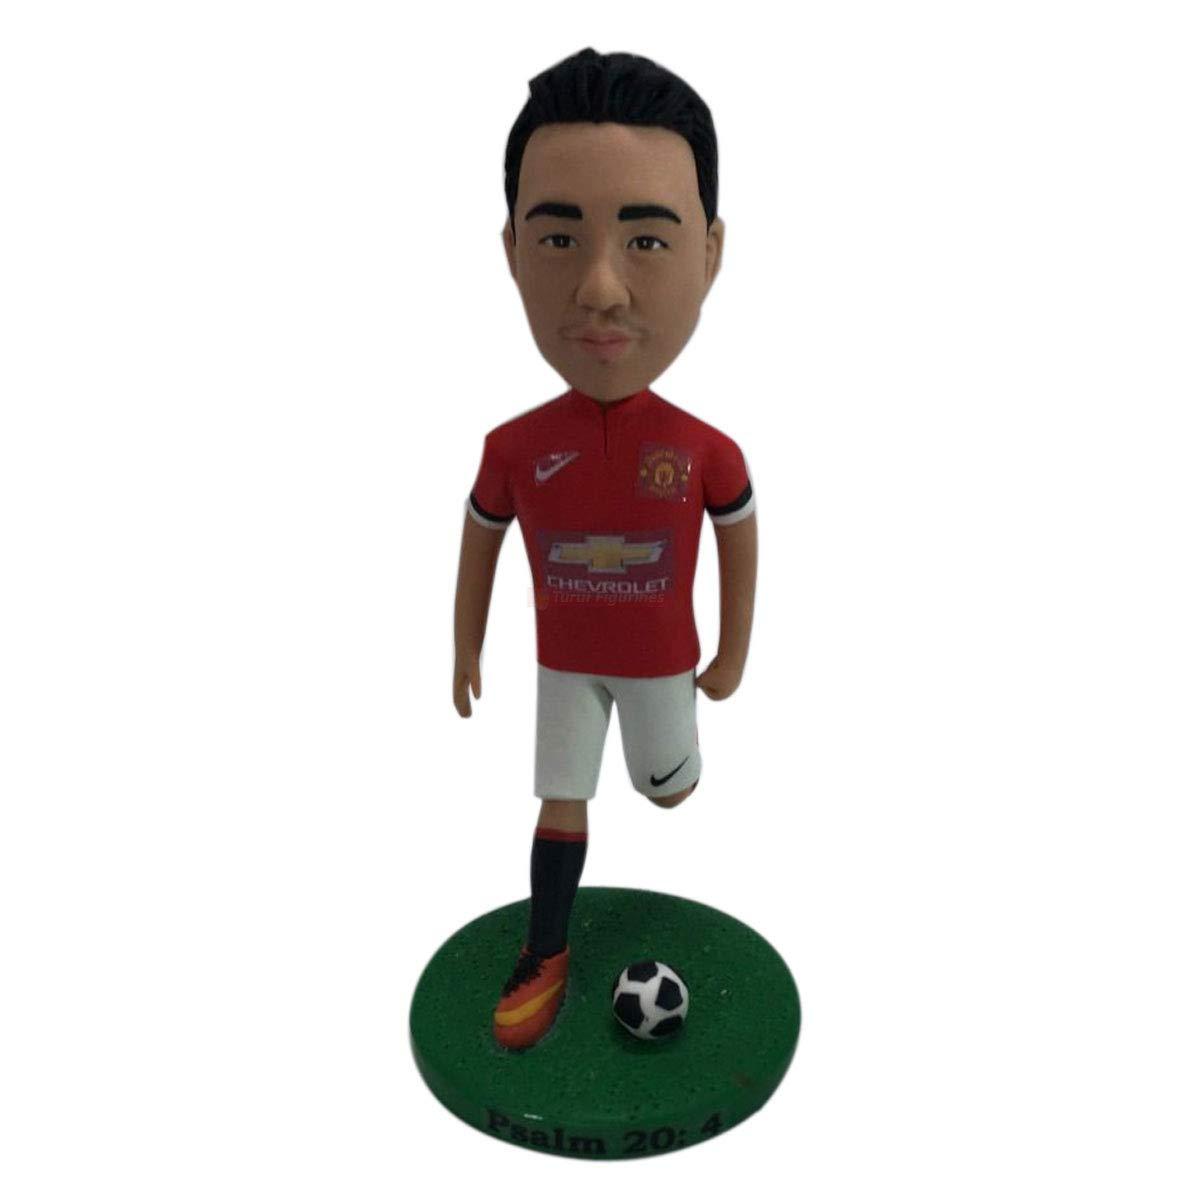 Soccer Bobble Head Personalized Soccer Cake Topper Soccer Personalized Gift Soccer Boyfriend Gift Soccer Christmas Gift Soccer Birthday Gift